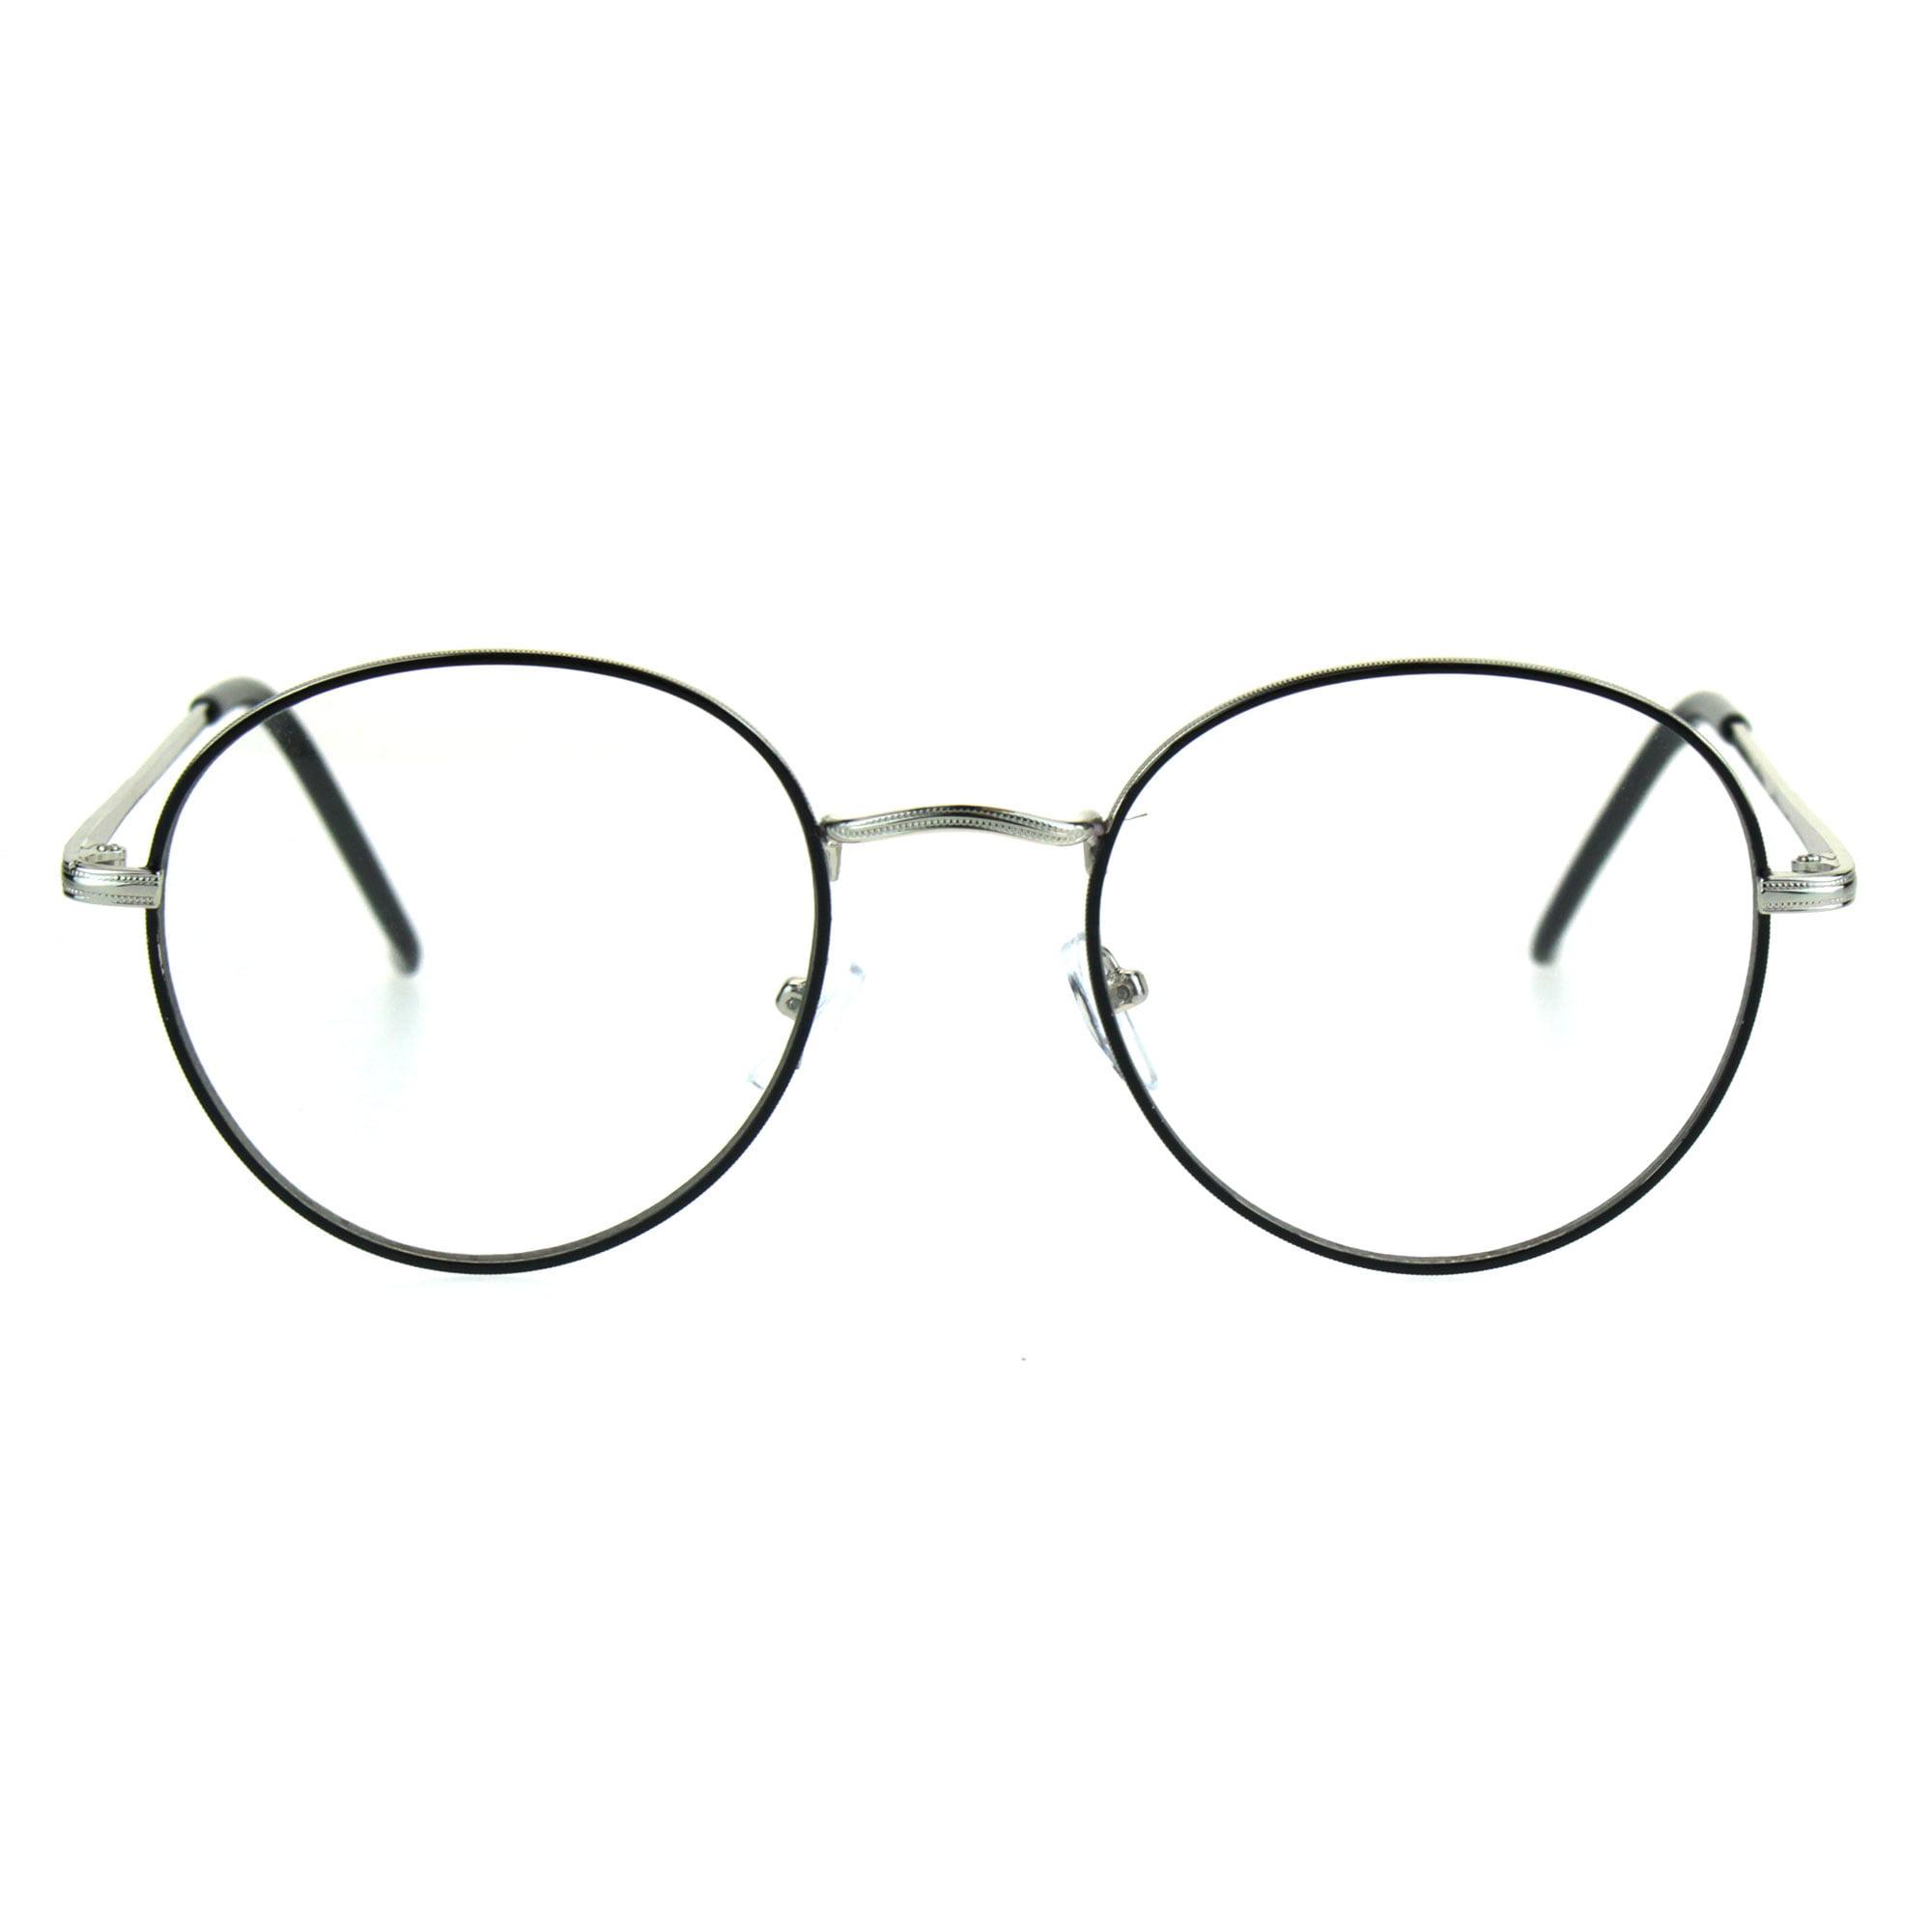 ac8208f1b35 Classic 90s Metal Rim Round Clear Lens Eye Glasses Frame Black Tortoise -  Walmart.com